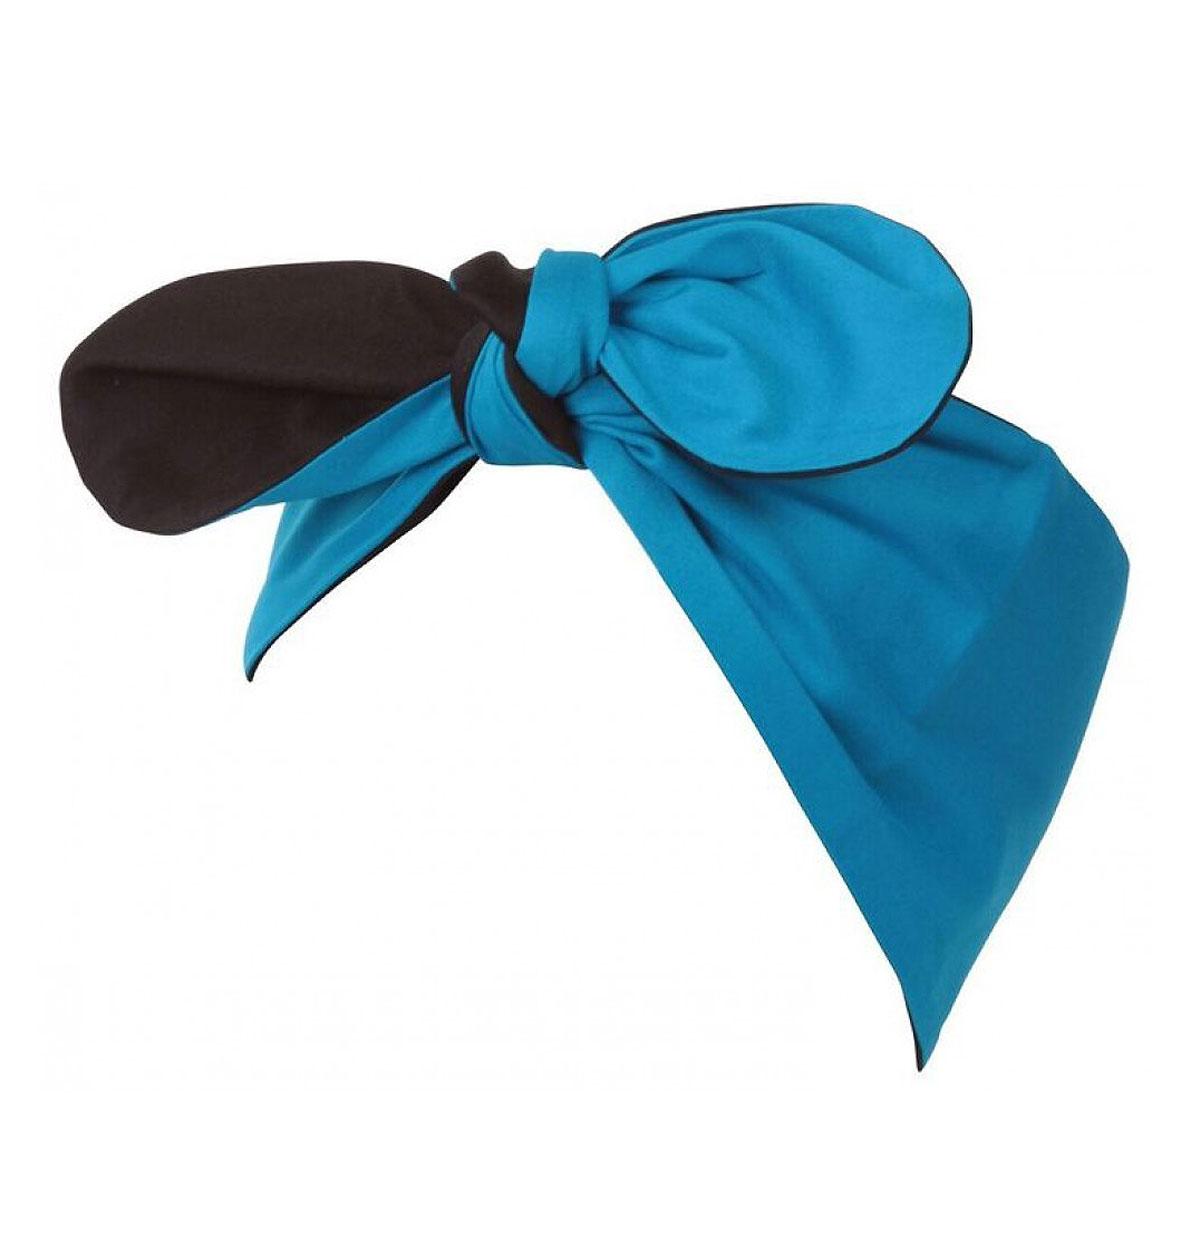 Vintage Inspired Plain Headband Turquoise/Zwart